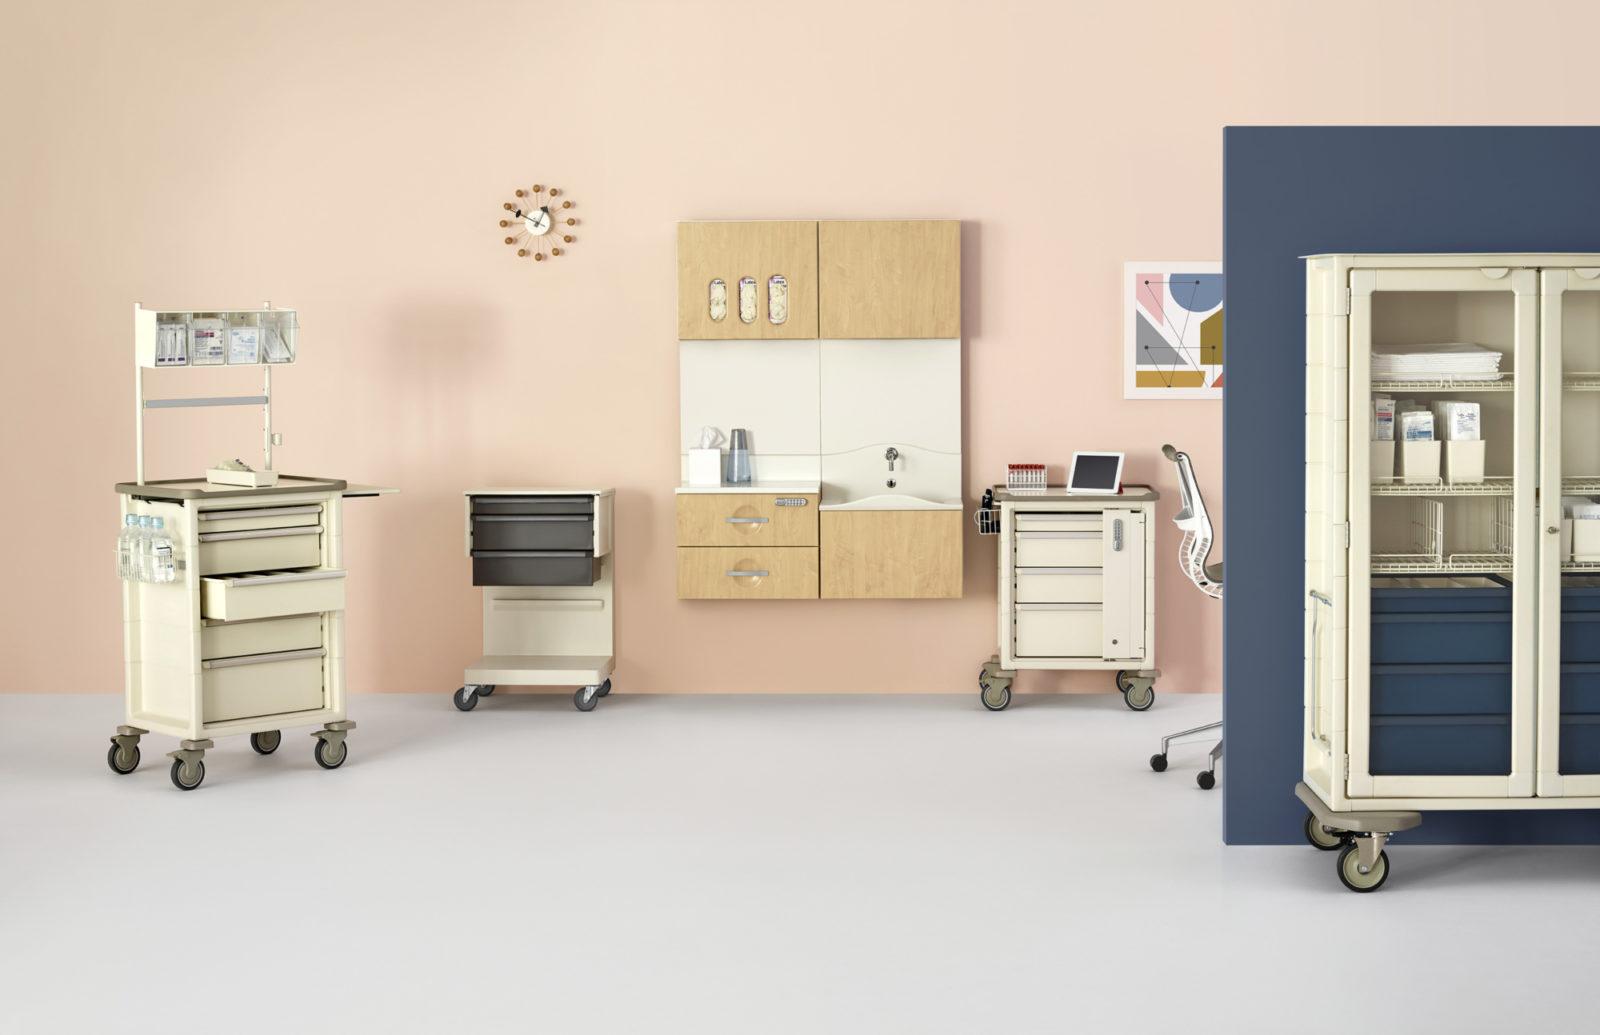 herman miller healthcare systems portland maine creative office pavilion medical cart donation maine medical center